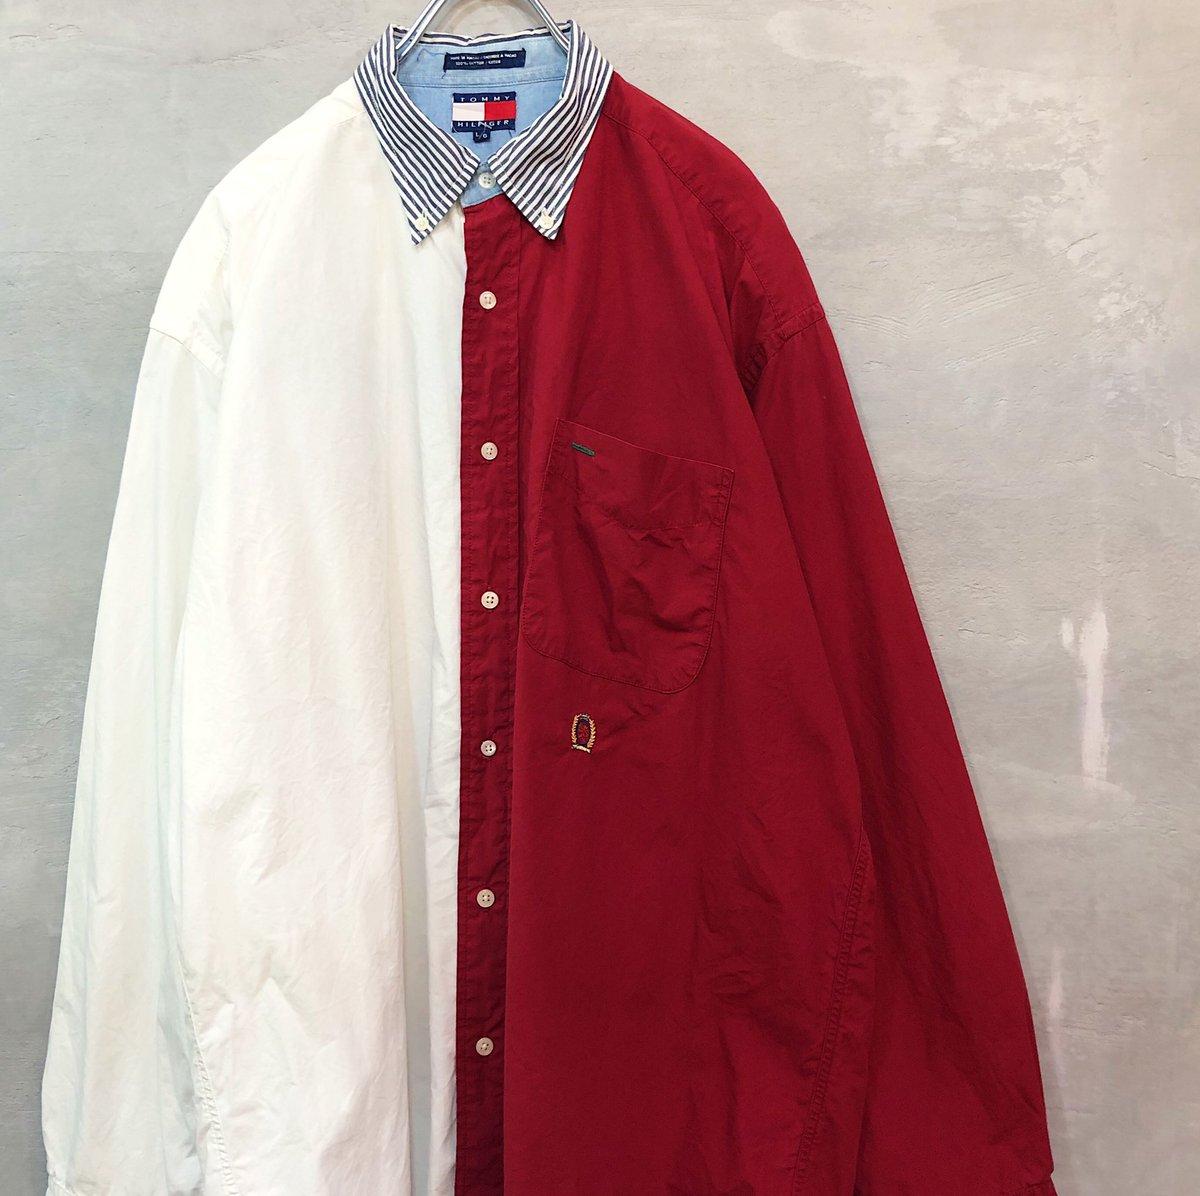 test ツイッターメディア - 店舗にて、 TOMMY の90'sシャツが大量入荷しました❗️ どれもイッテンモノですので、お探しの方はお早めに💨💨  #久留米 #福岡 #佐賀 #熊本 #大分 #古着 #古着屋 https://t.co/XjHHn7Bsg1